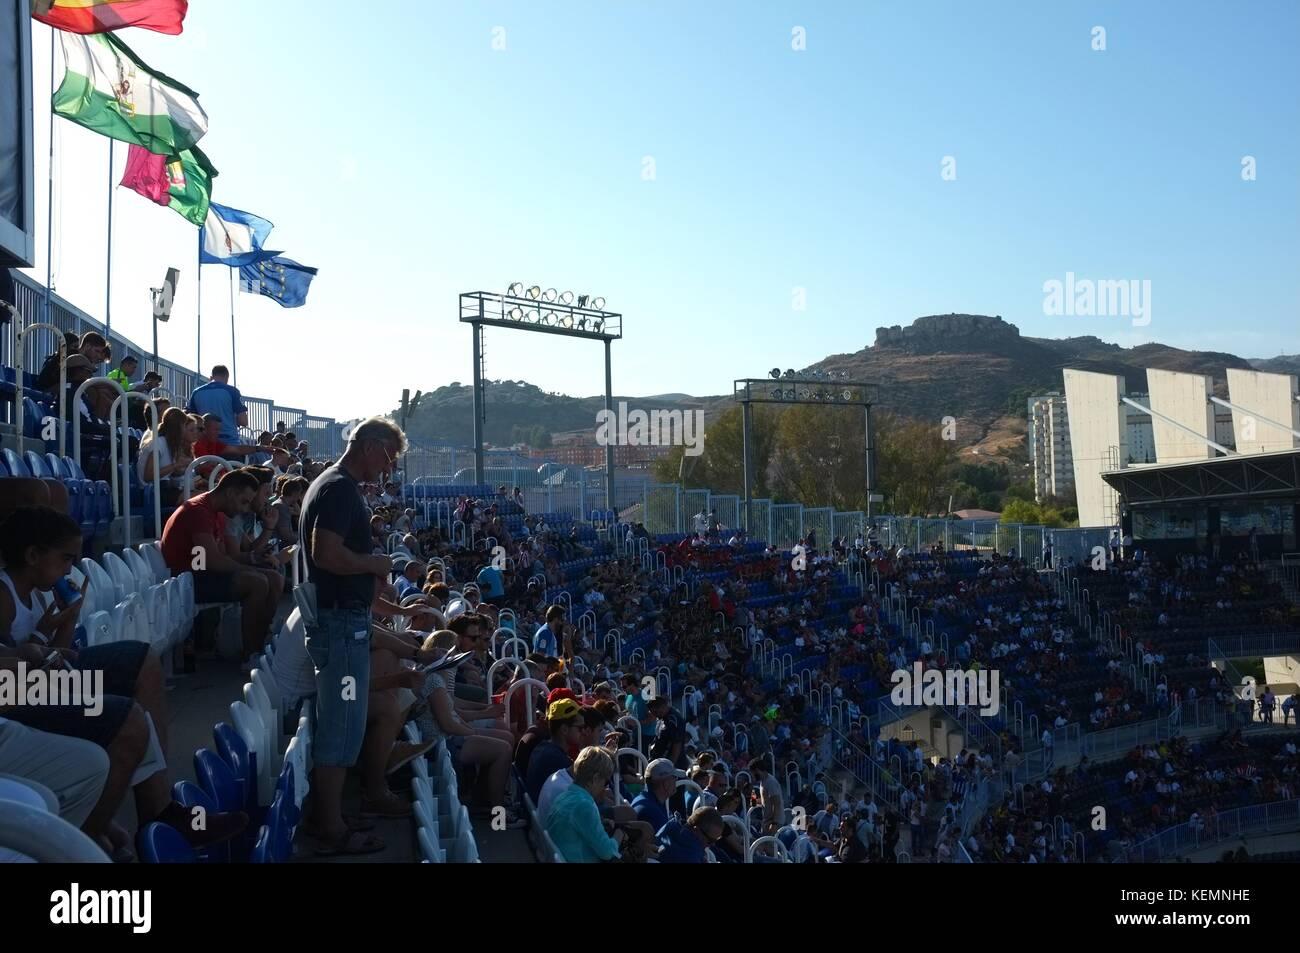 Inside the La Rosaleda Stadium during Malaga CF v Athletico Bilbao, Malaga, Andalucia, Spain, September 2017 - Stock Image